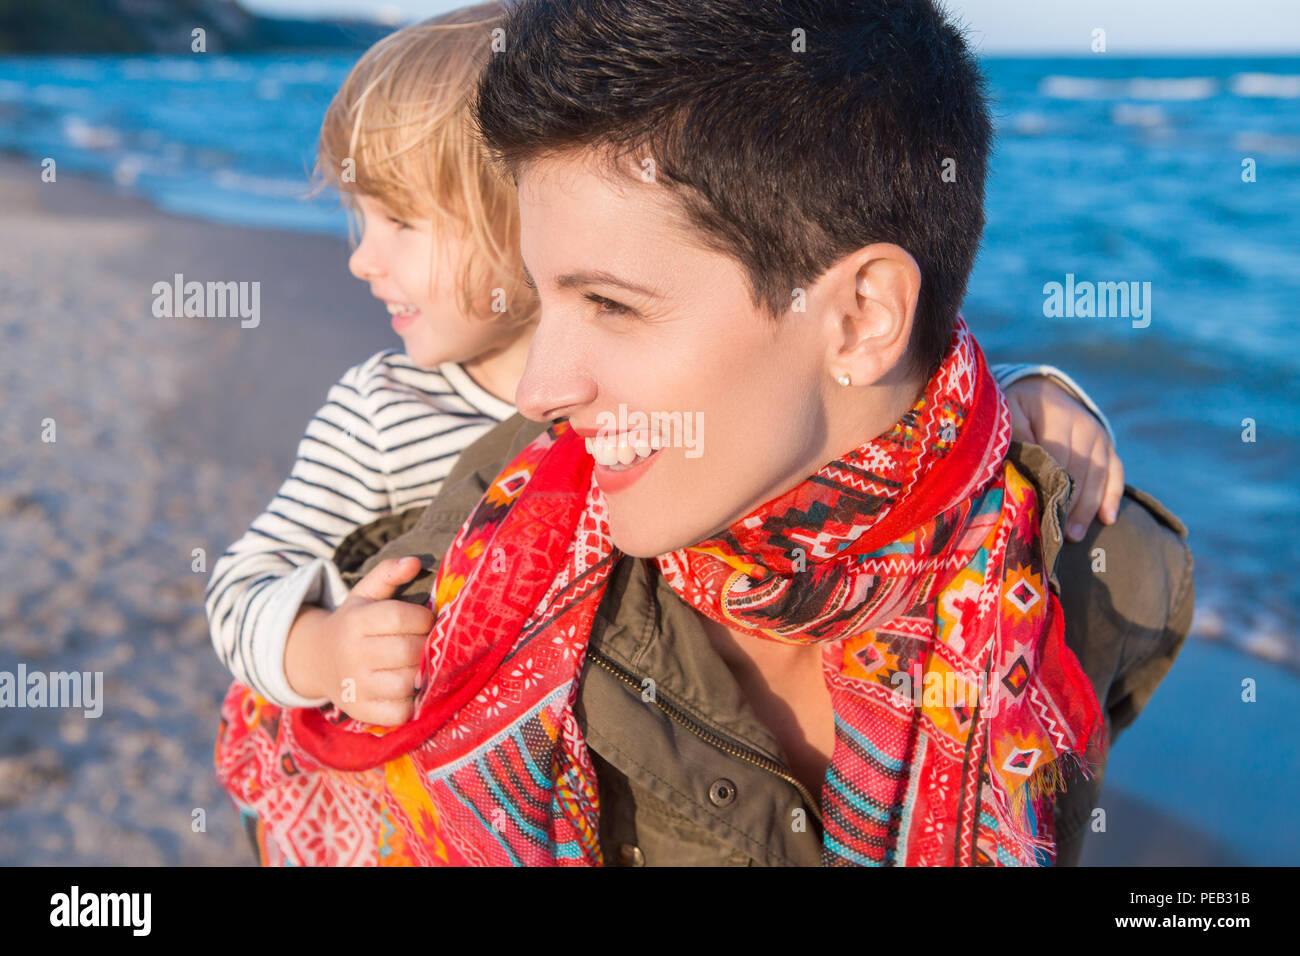 Retrato de grupo caucásico blanco sonriente, madre e hija niña, piggy back riding, jugando ejecuta en mar océano playa al atardecer al aire libre, hap Imagen De Stock